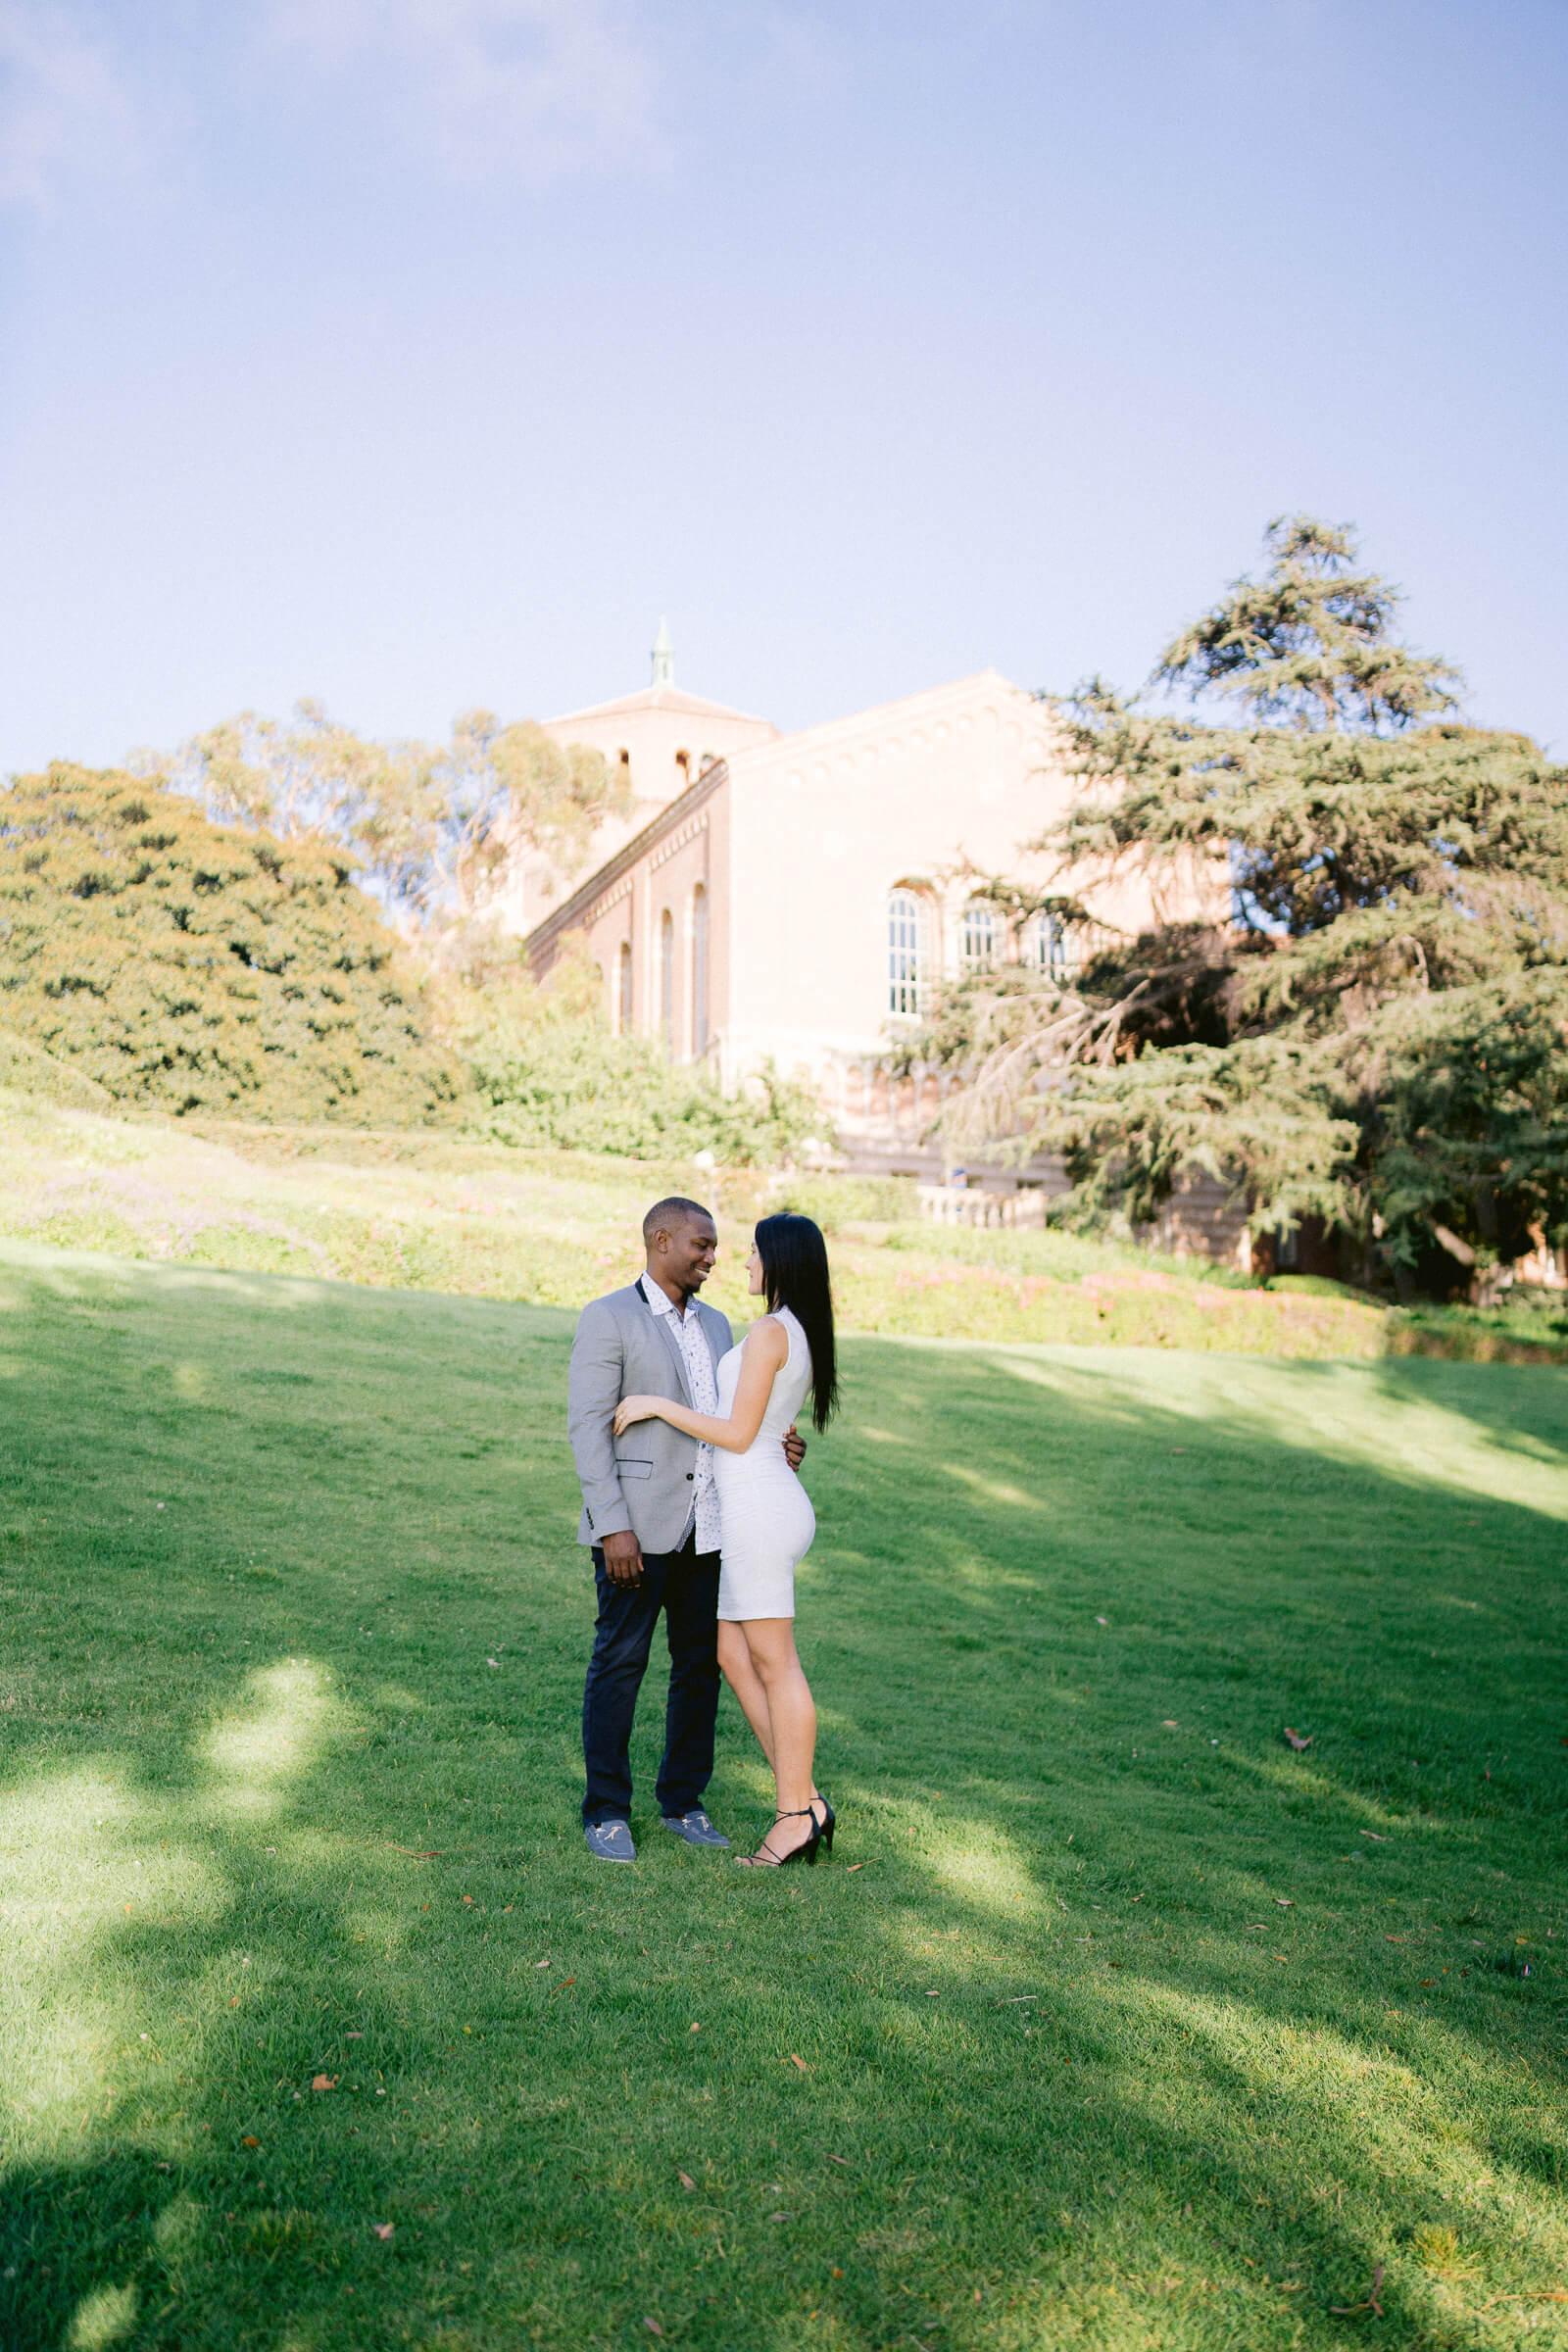 ucla-los-angeles-proposal-photographer-43.jpg